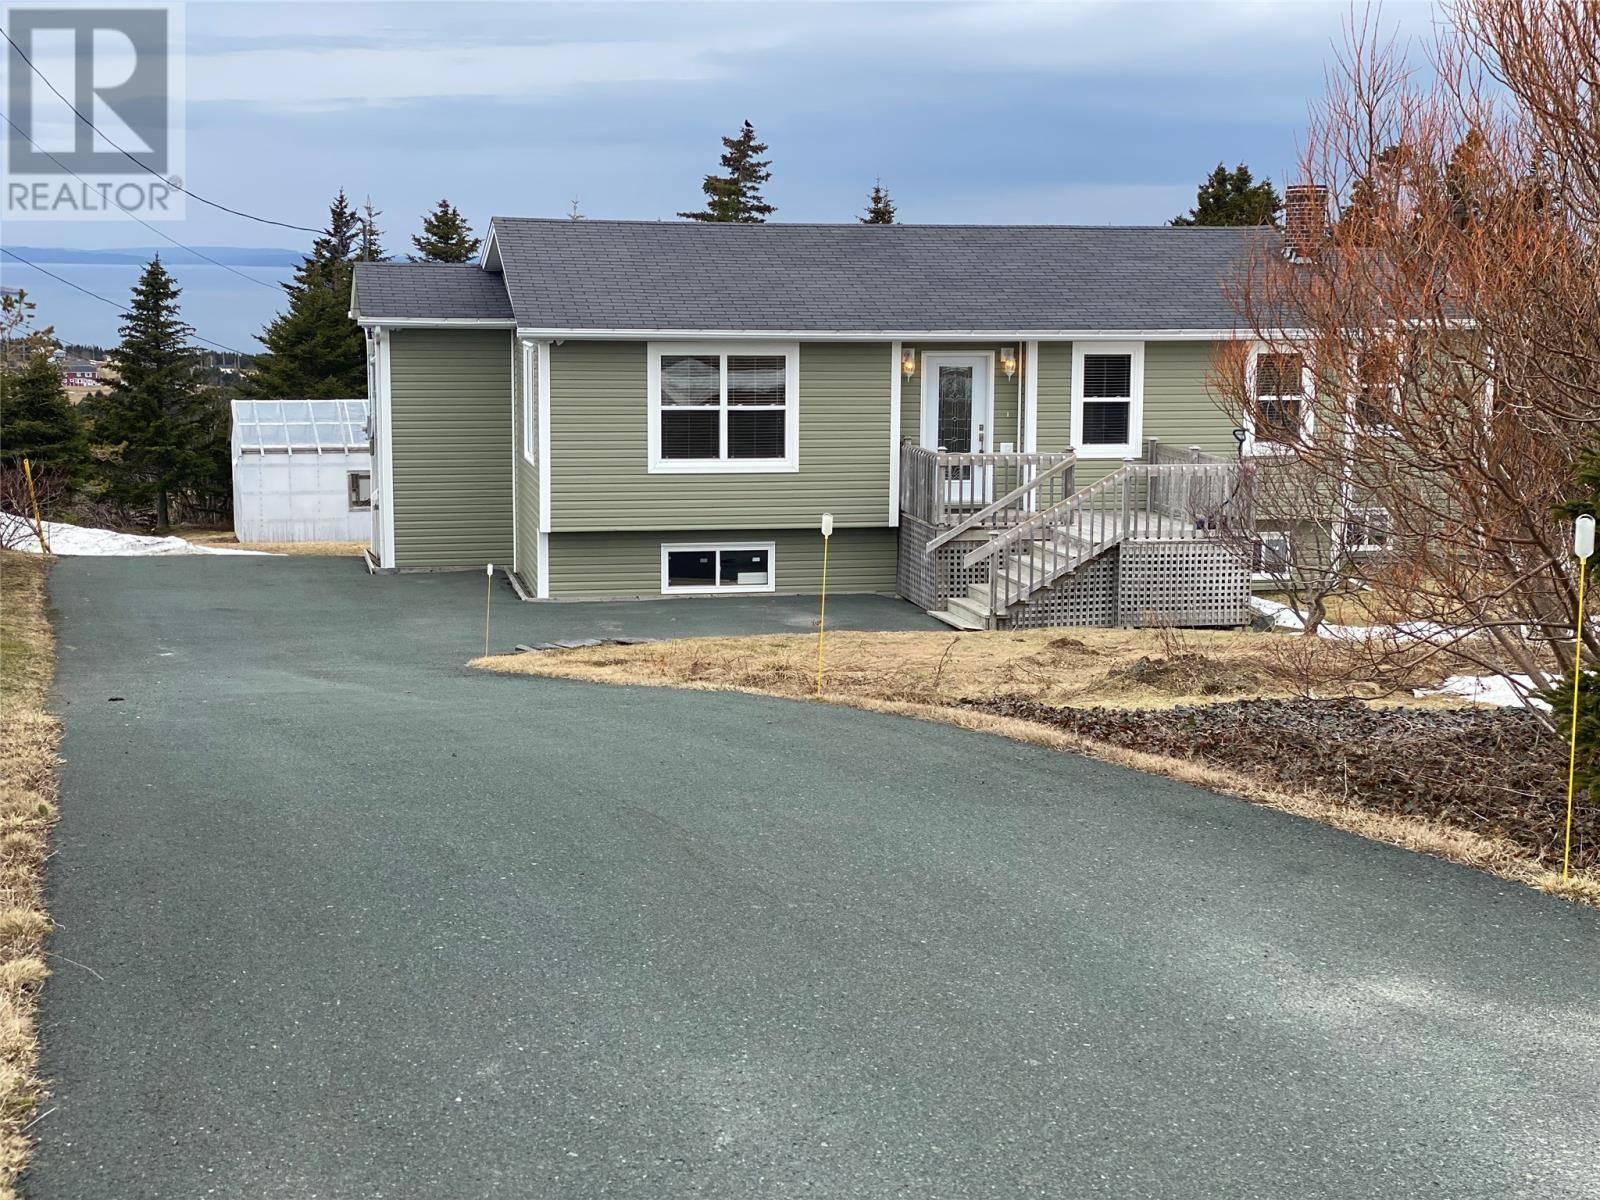 House for sale at 247 Tolt Rd St. Phillips Newfoundland - MLS: 1210087